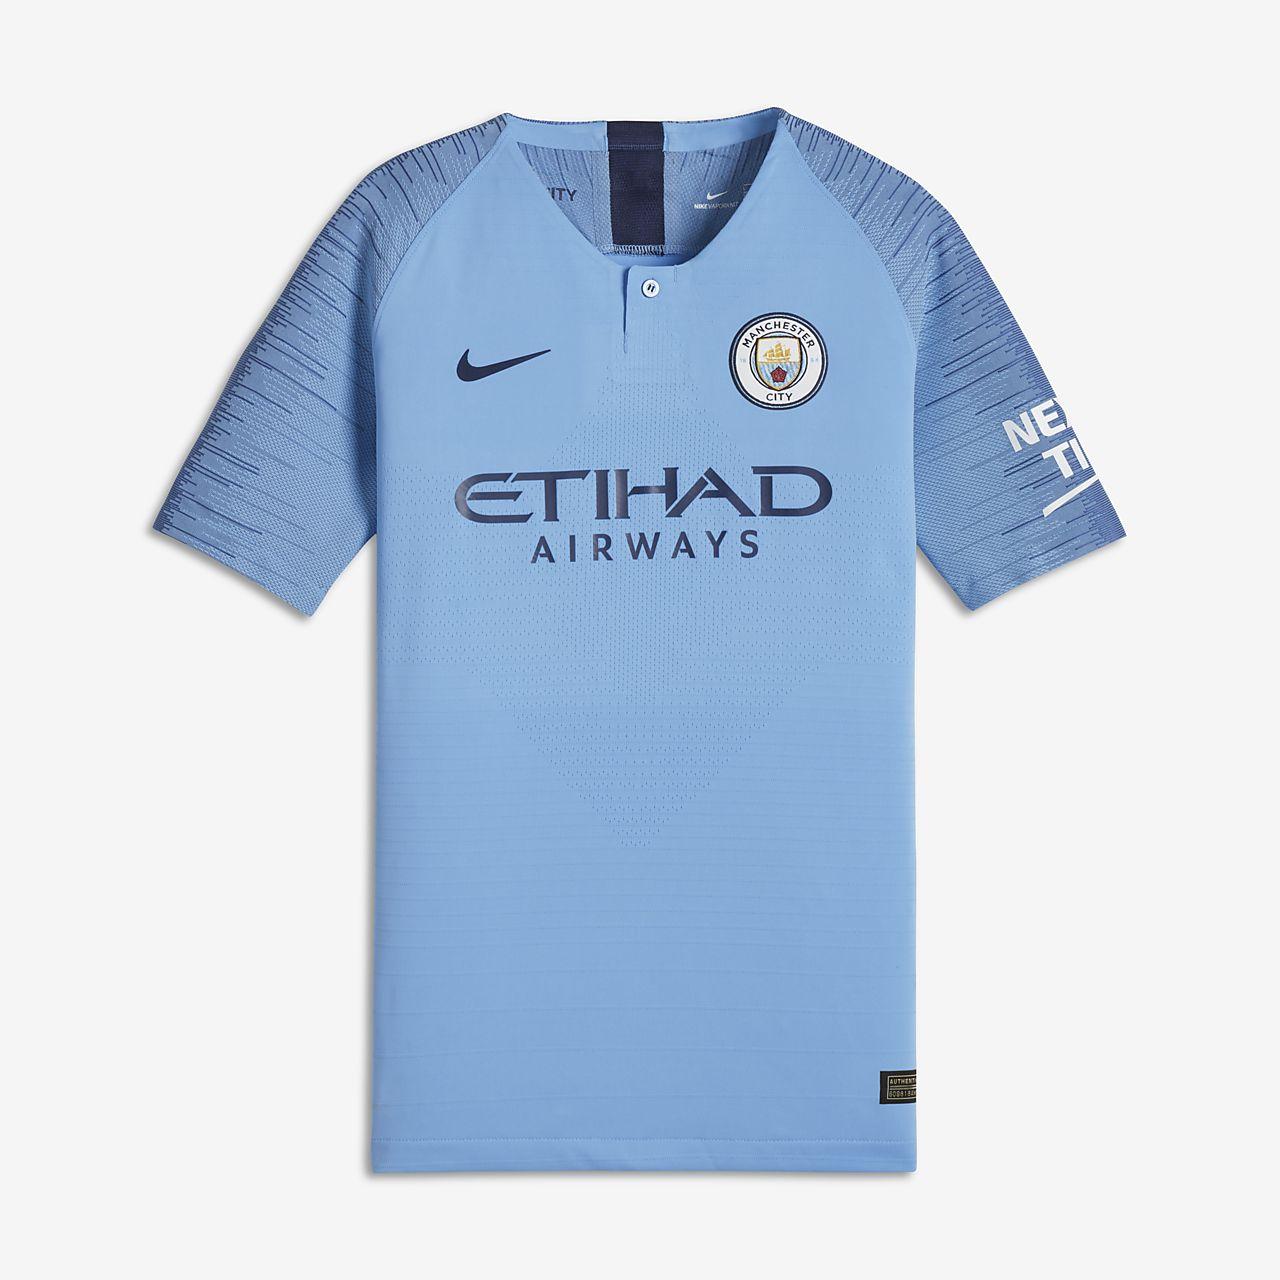 2018/19 Manchester City FC Vapor Match Home Camiseta de fútbol - Niño/a